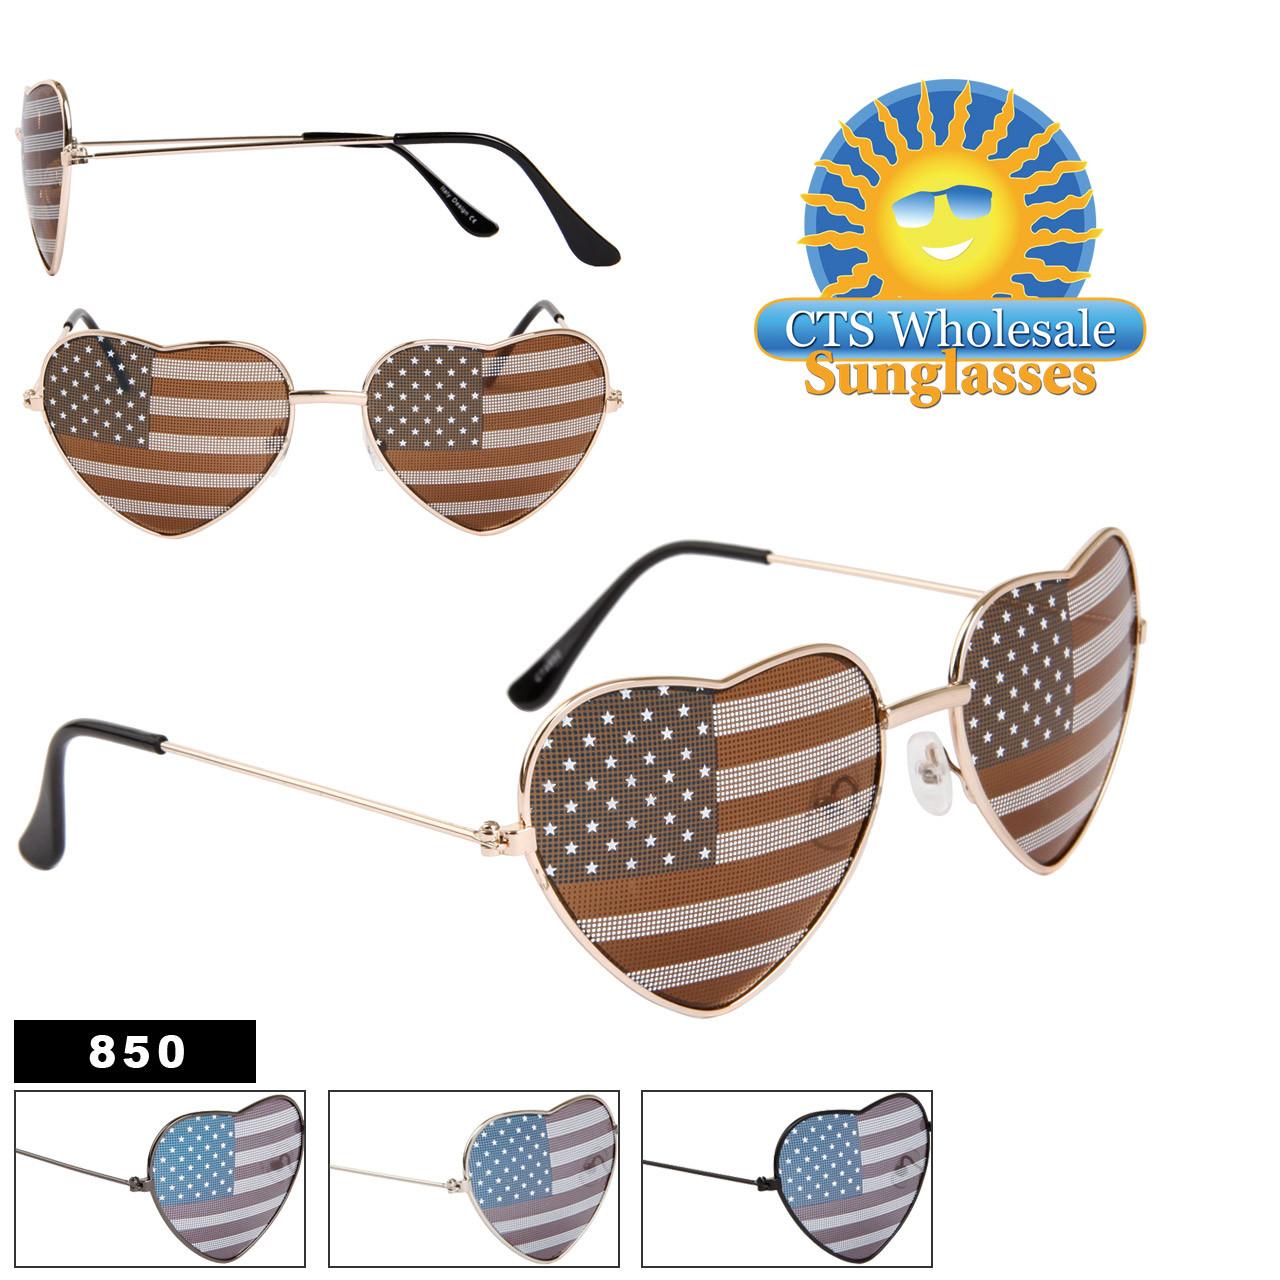 American Flag Heart Sunglasses Wholesale 850